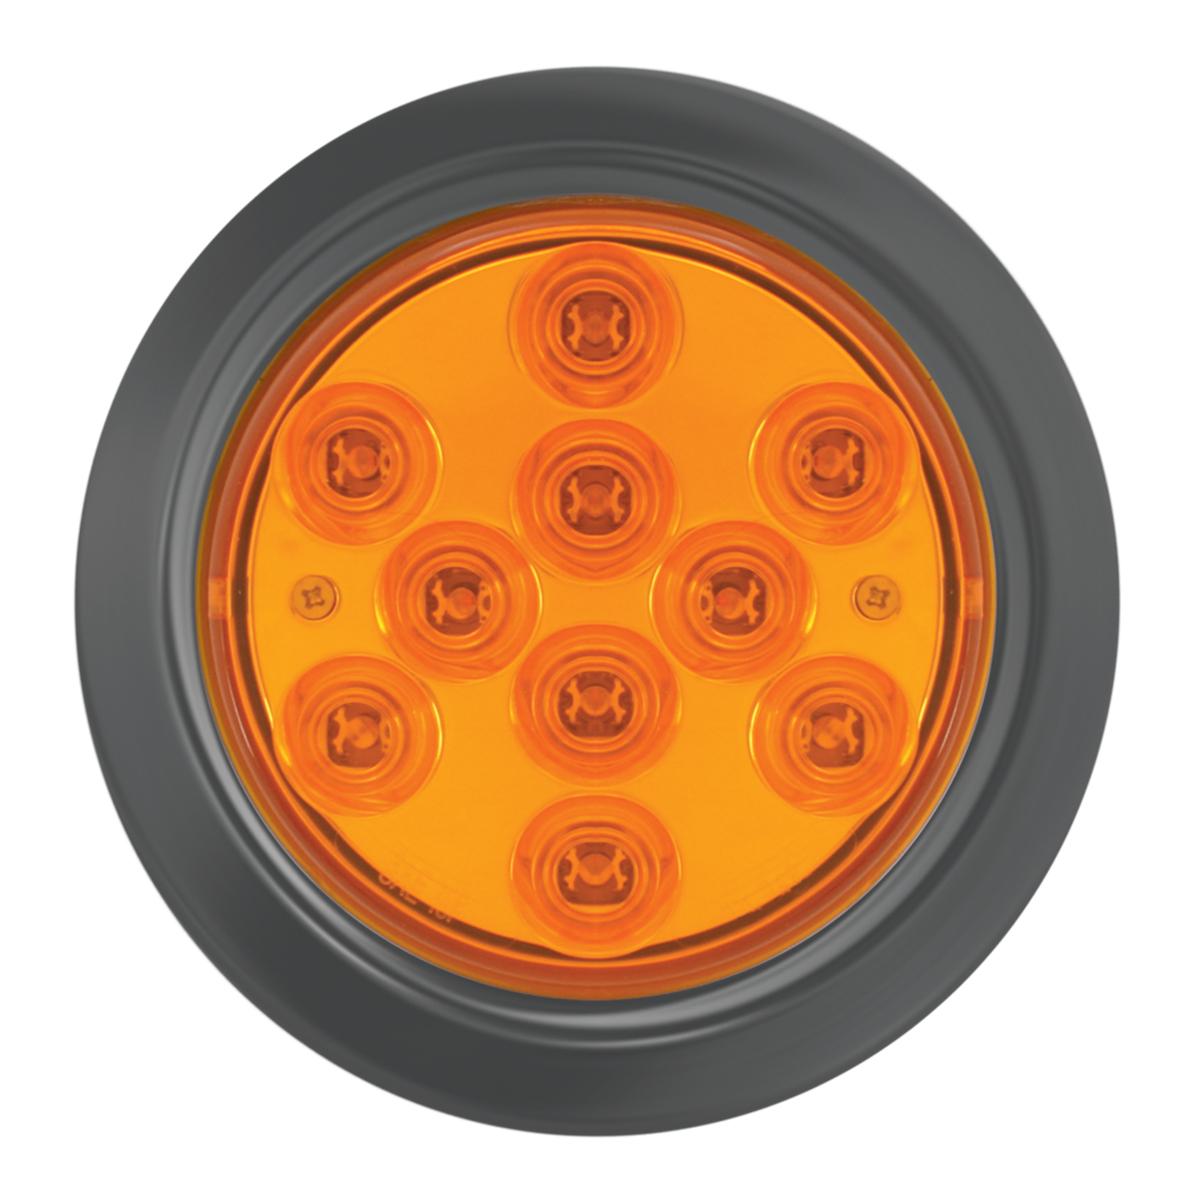 "76844 4"" Mega 10 Plus LED Light w/ Black Rubber Grommet"